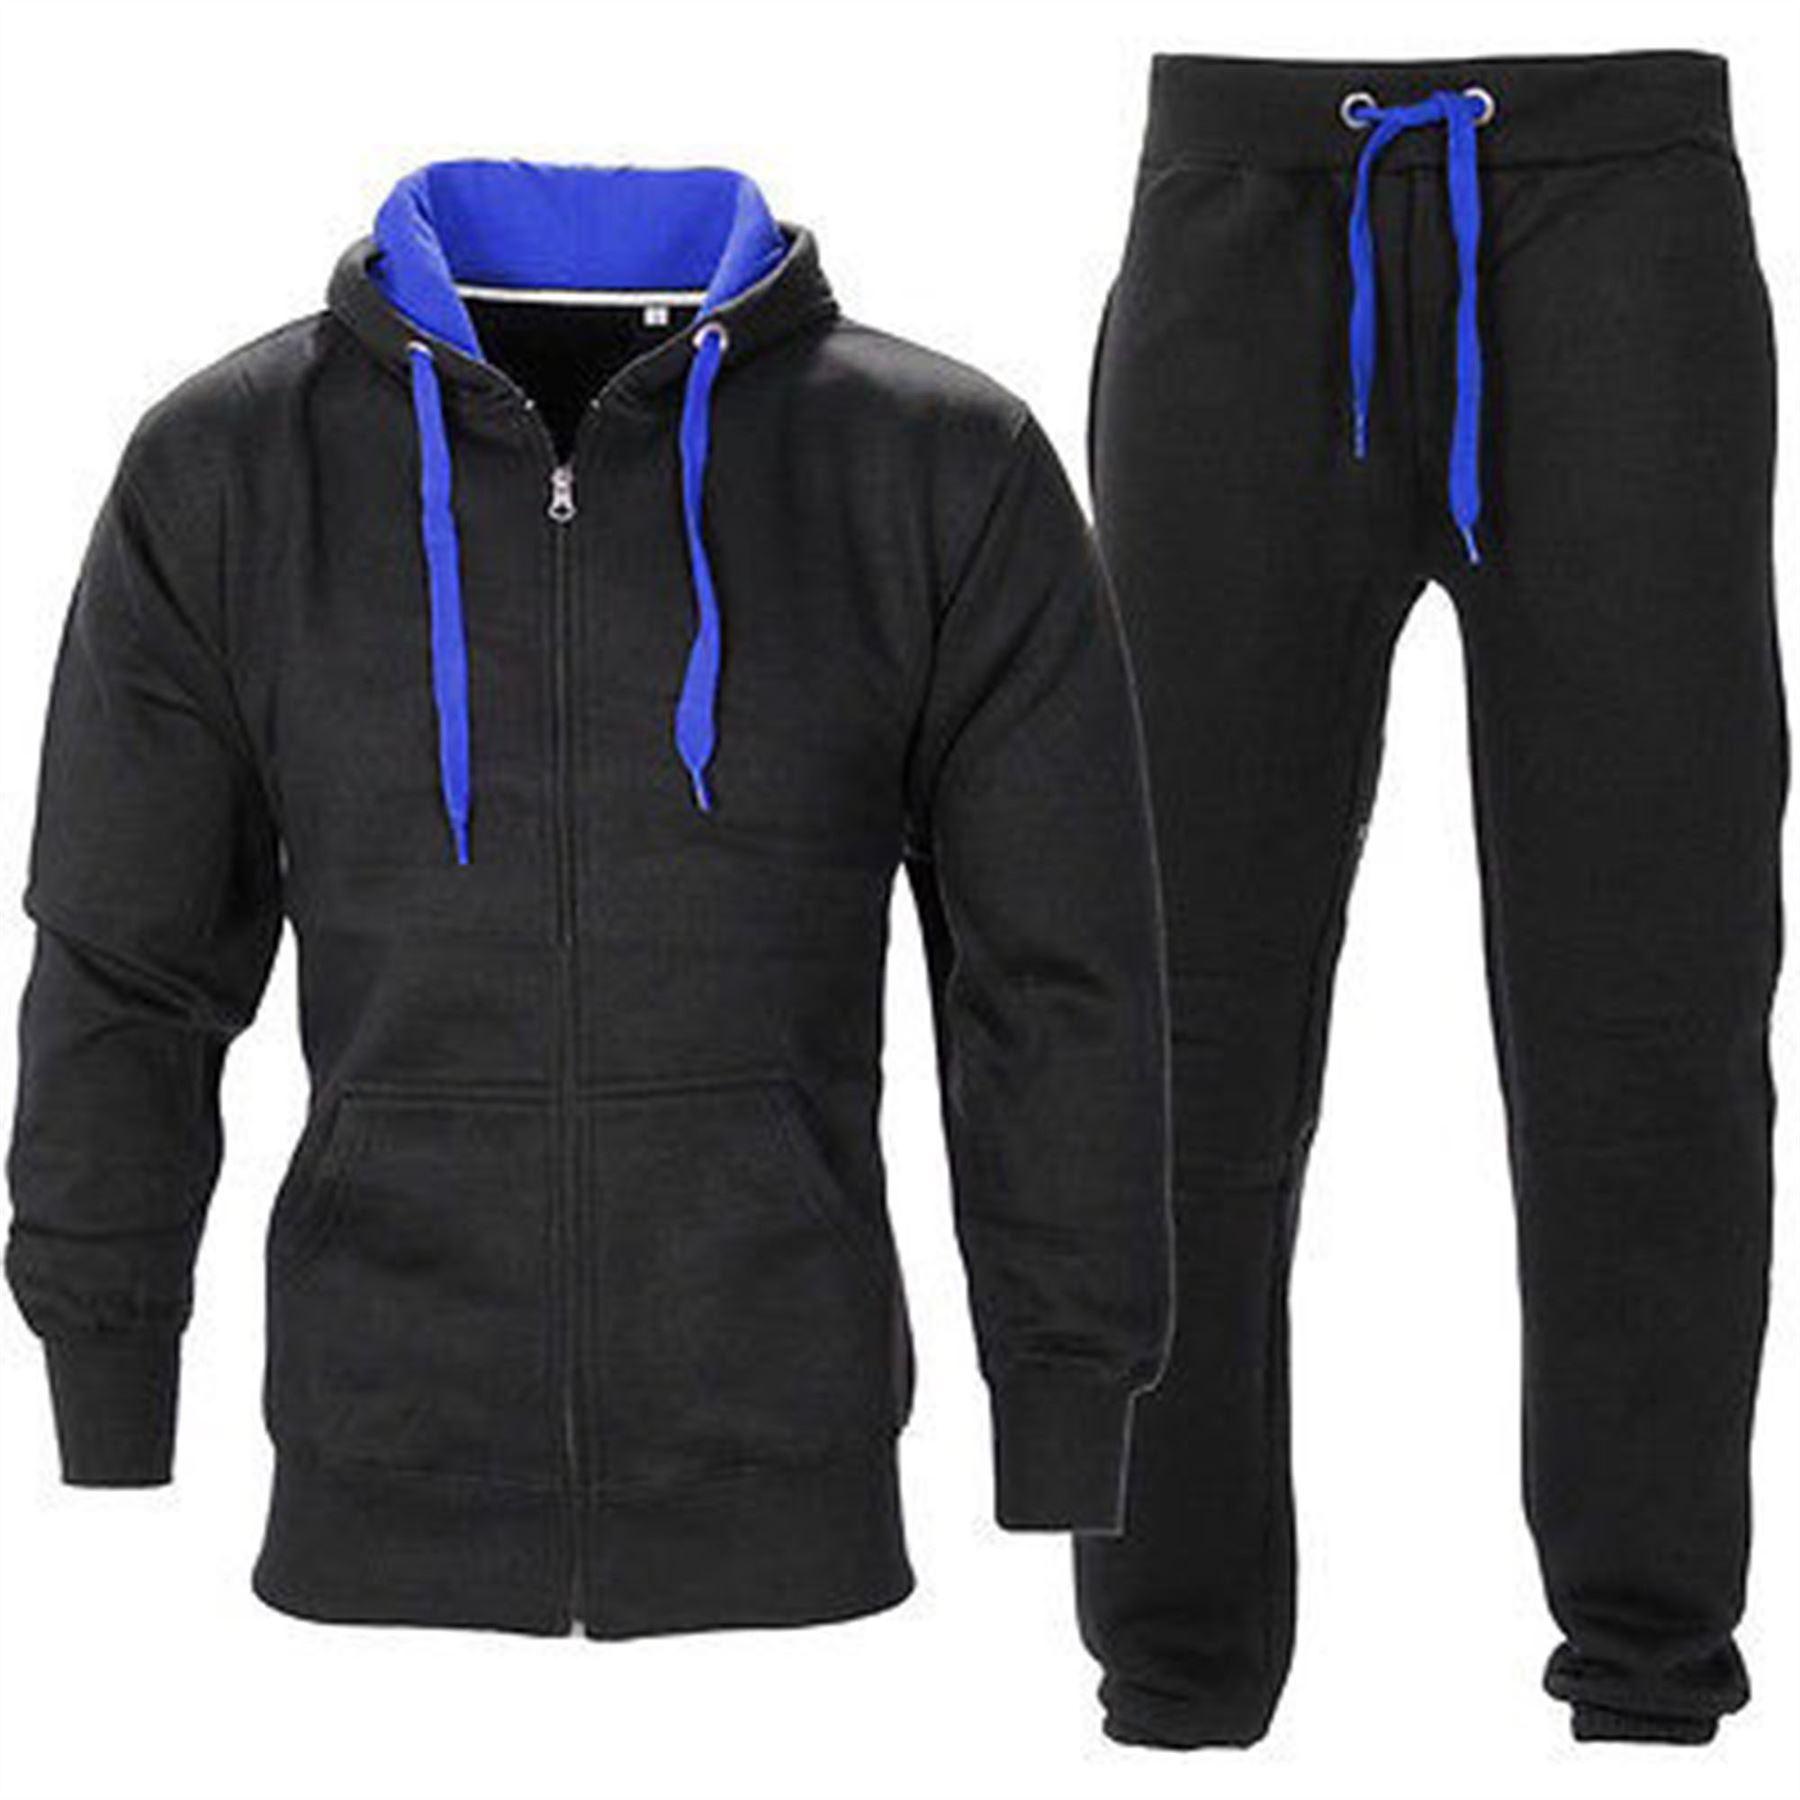 Mens Hooded Tracksuit Gym Contrast Jogging Full Top Fleece ...